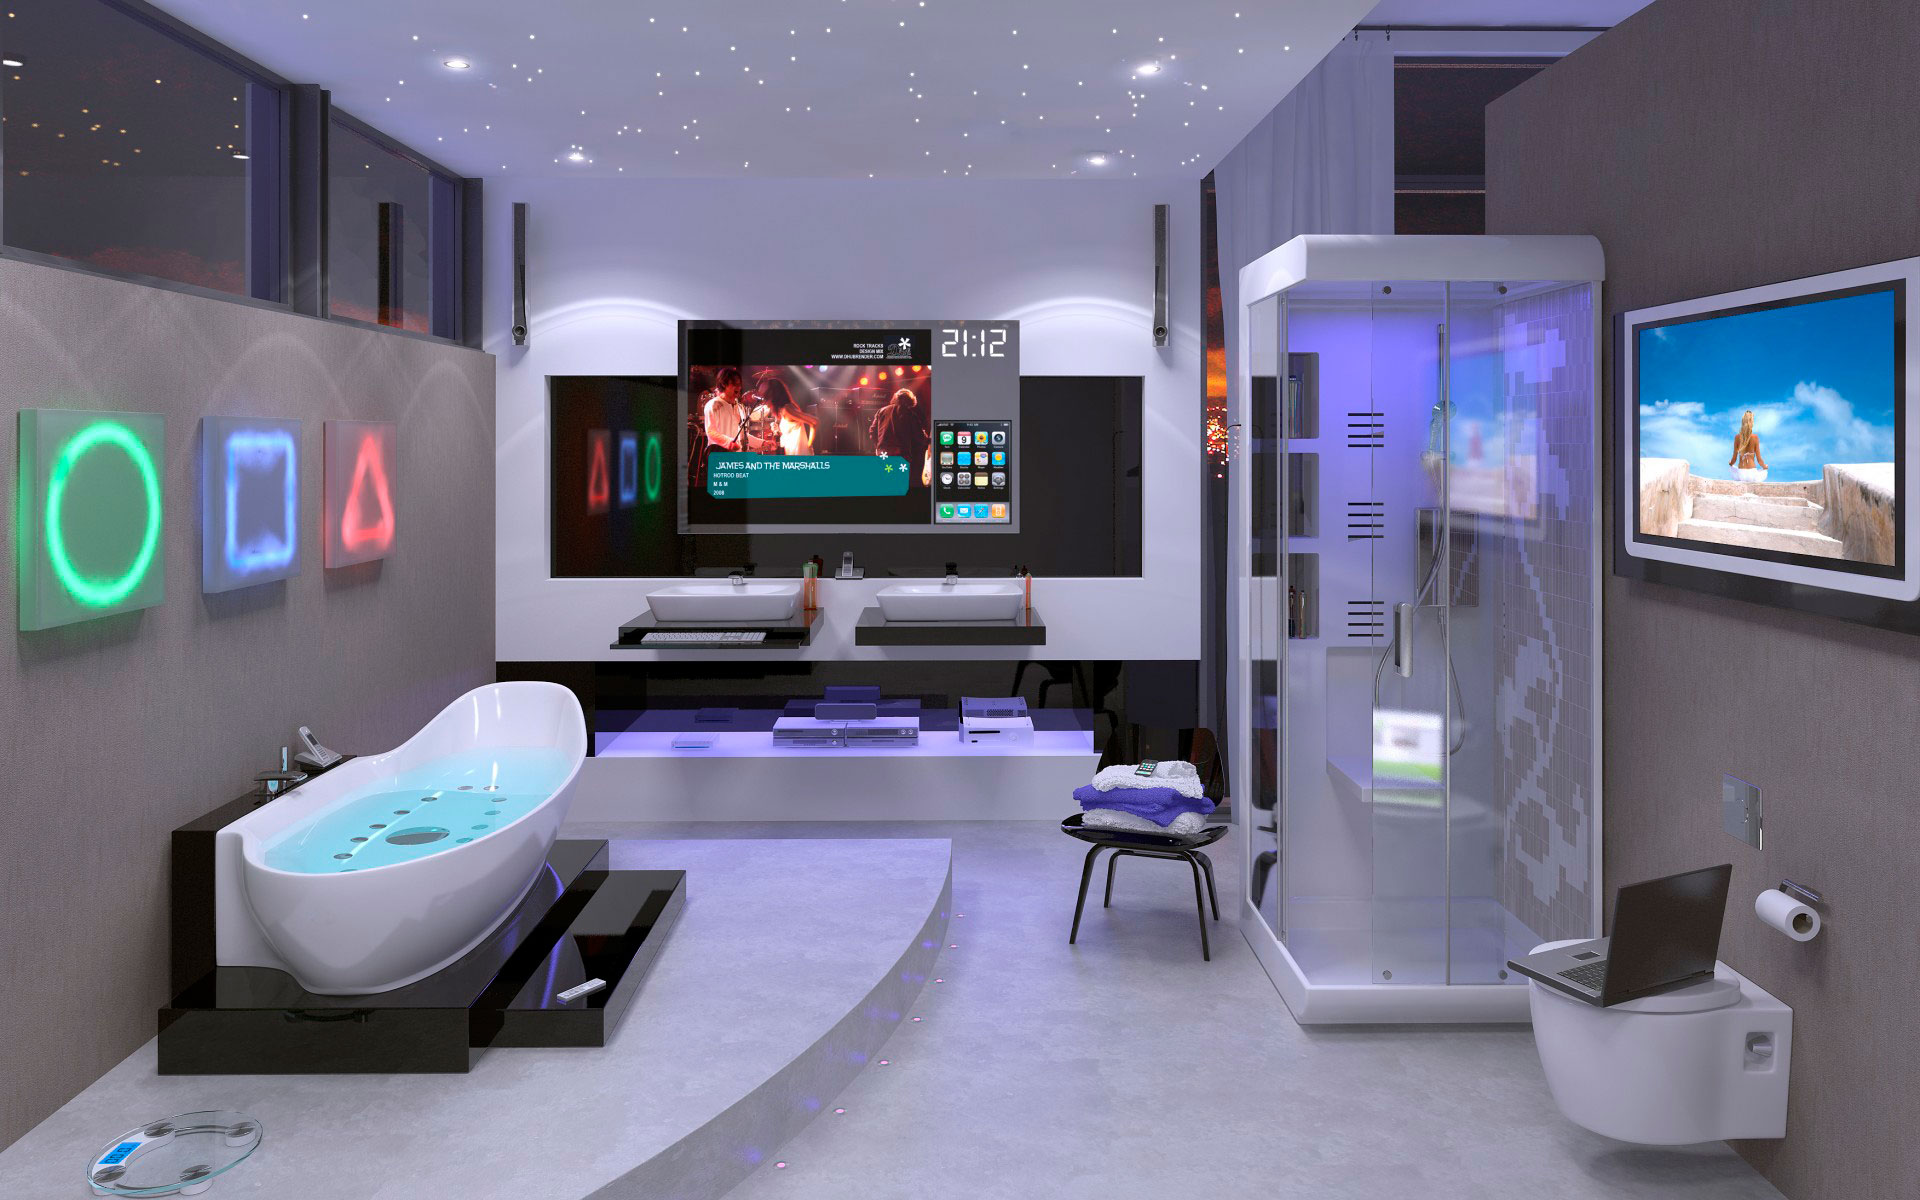 Телевизор с подключением к умному дому в ванной комнате